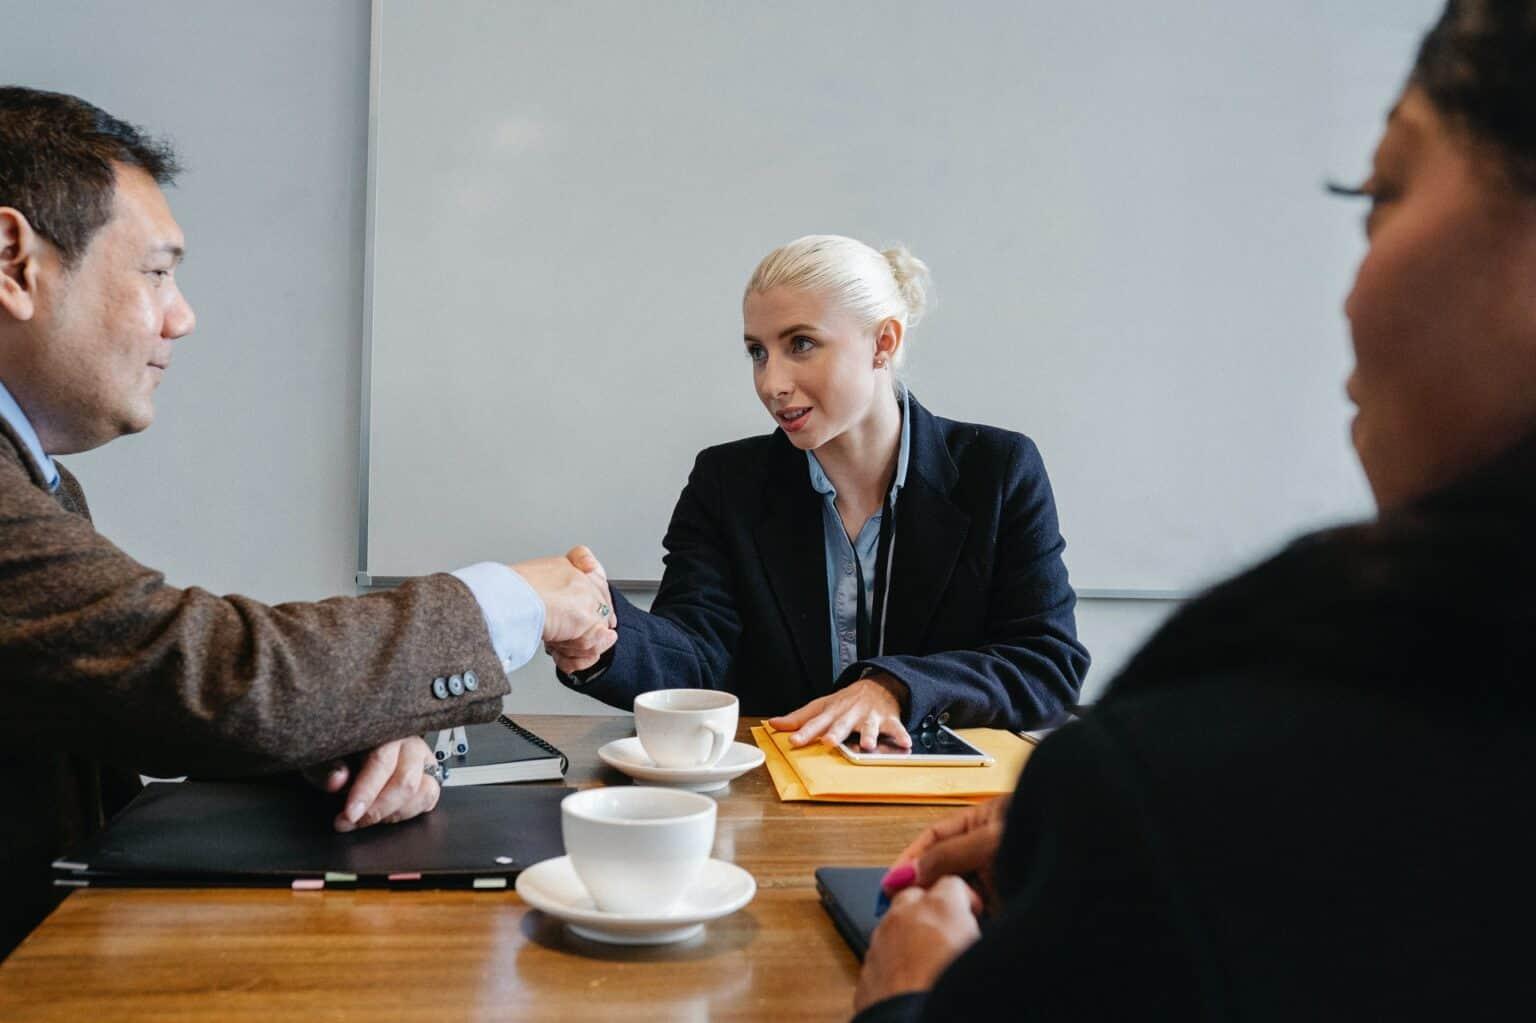 Multiple Business People Striking Deal in Office